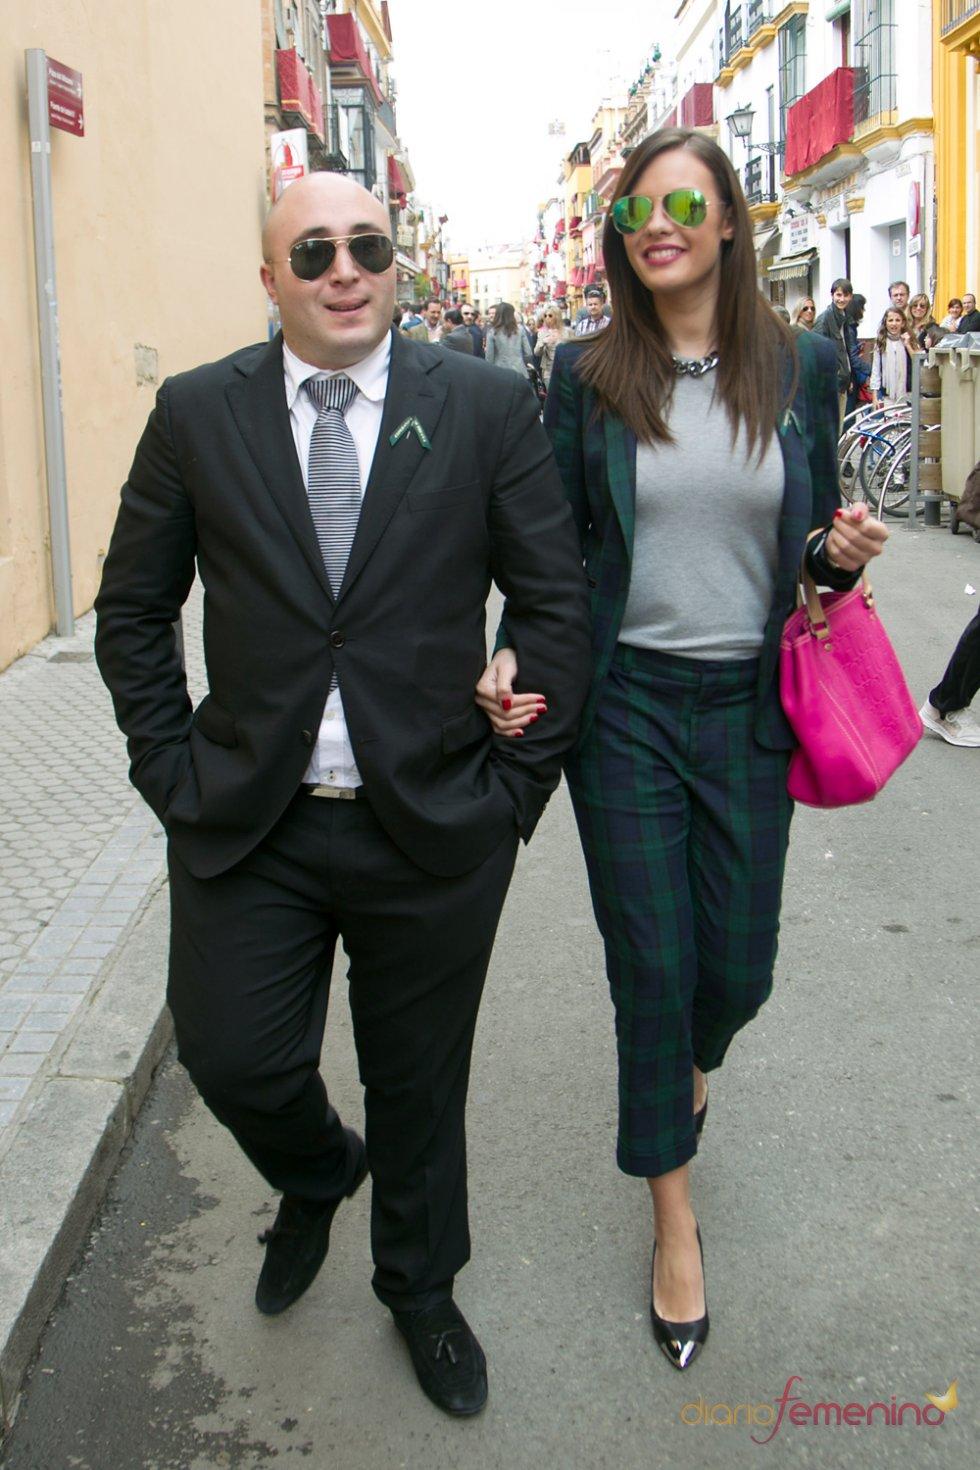 Kiko Rivera y Jessica Bueno en Sevilla durante la Semana Santa